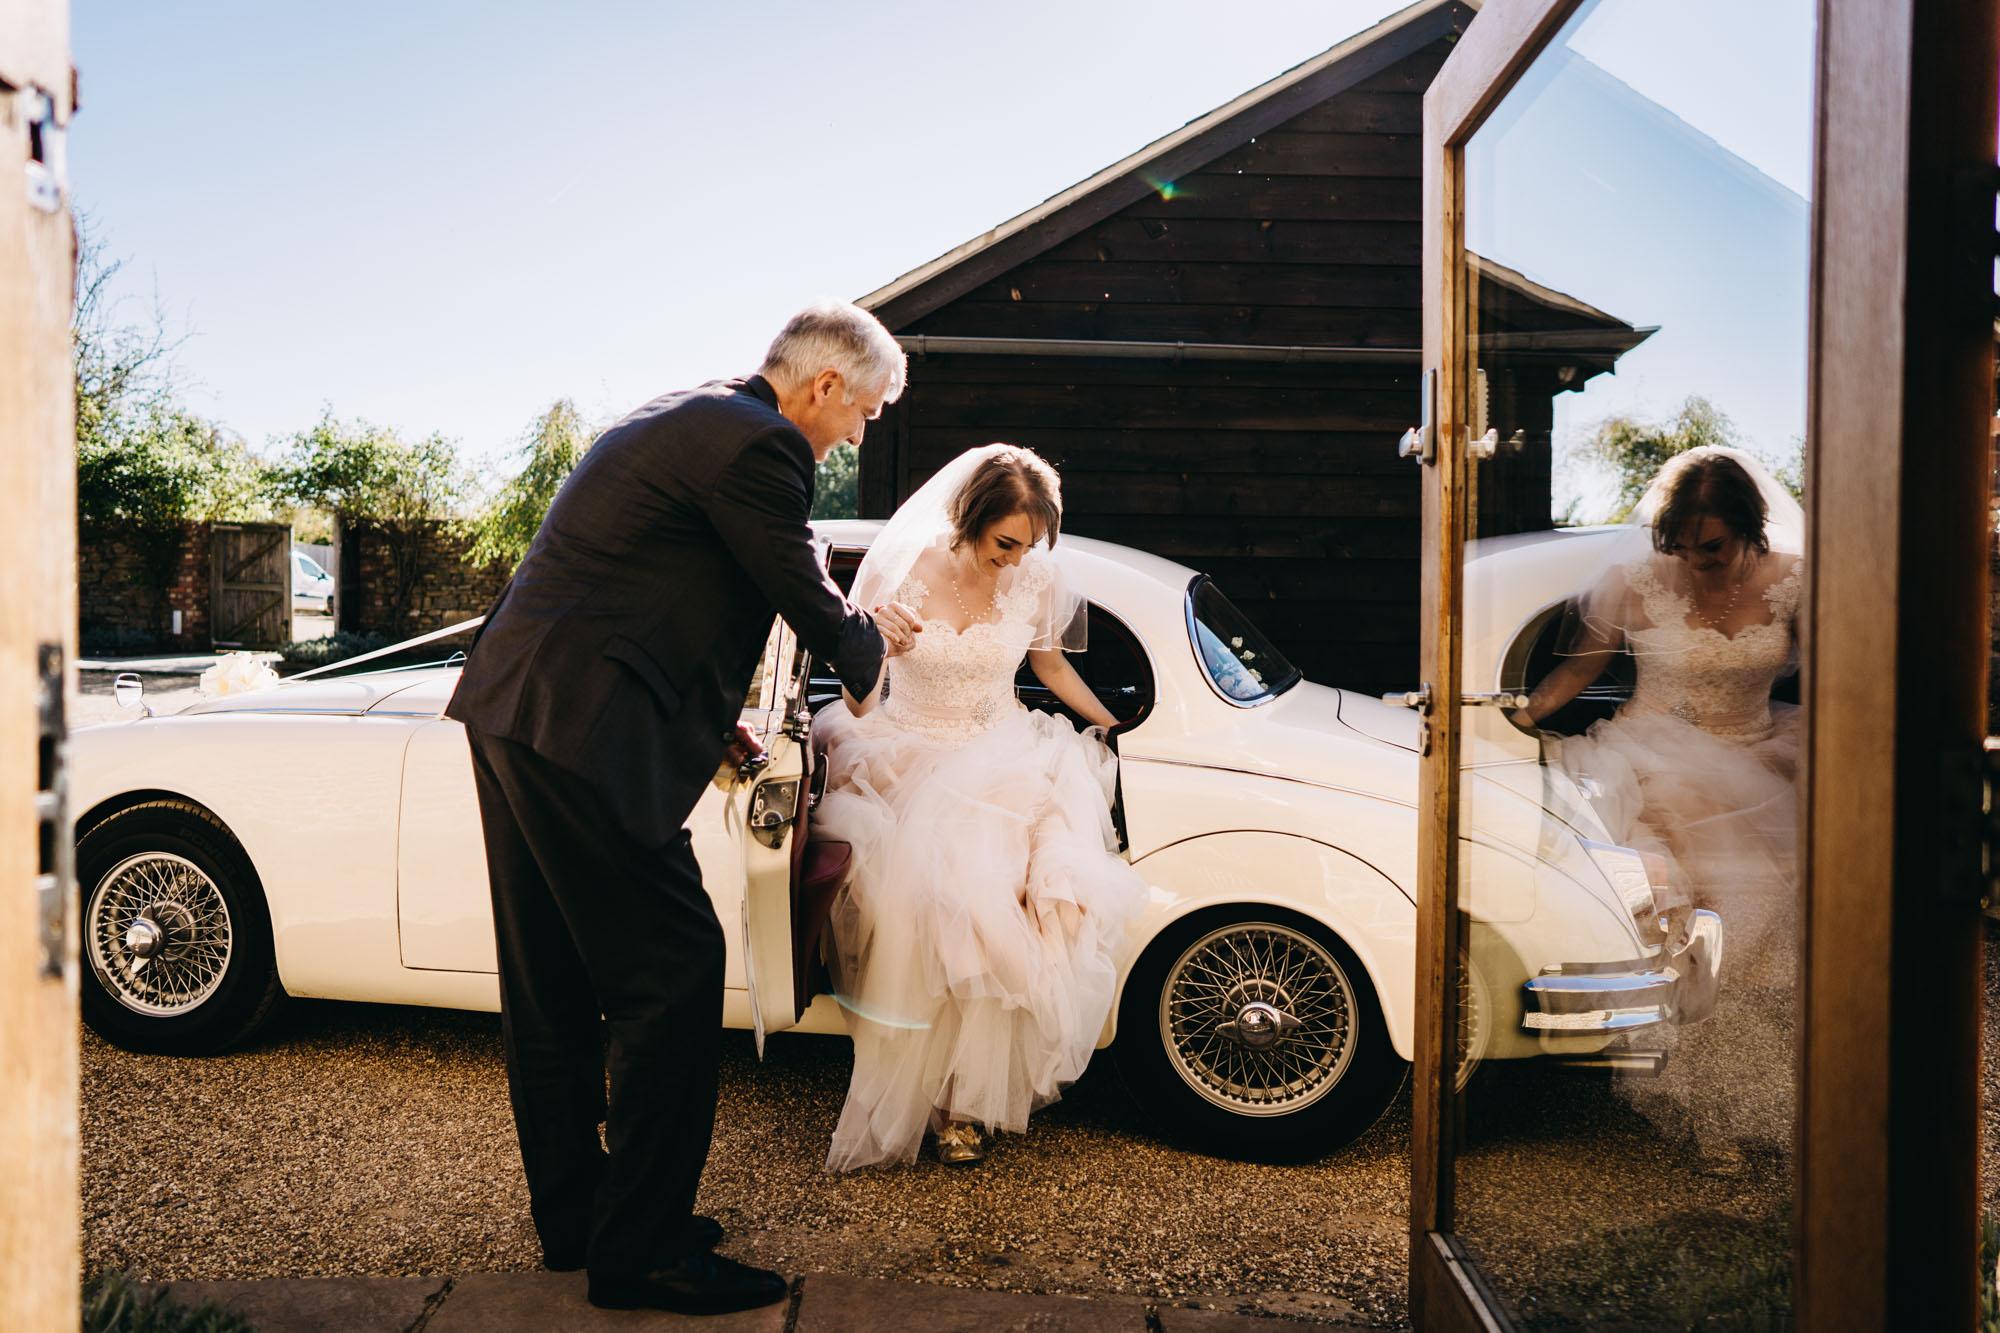 wedding-at-dodford-manor-25